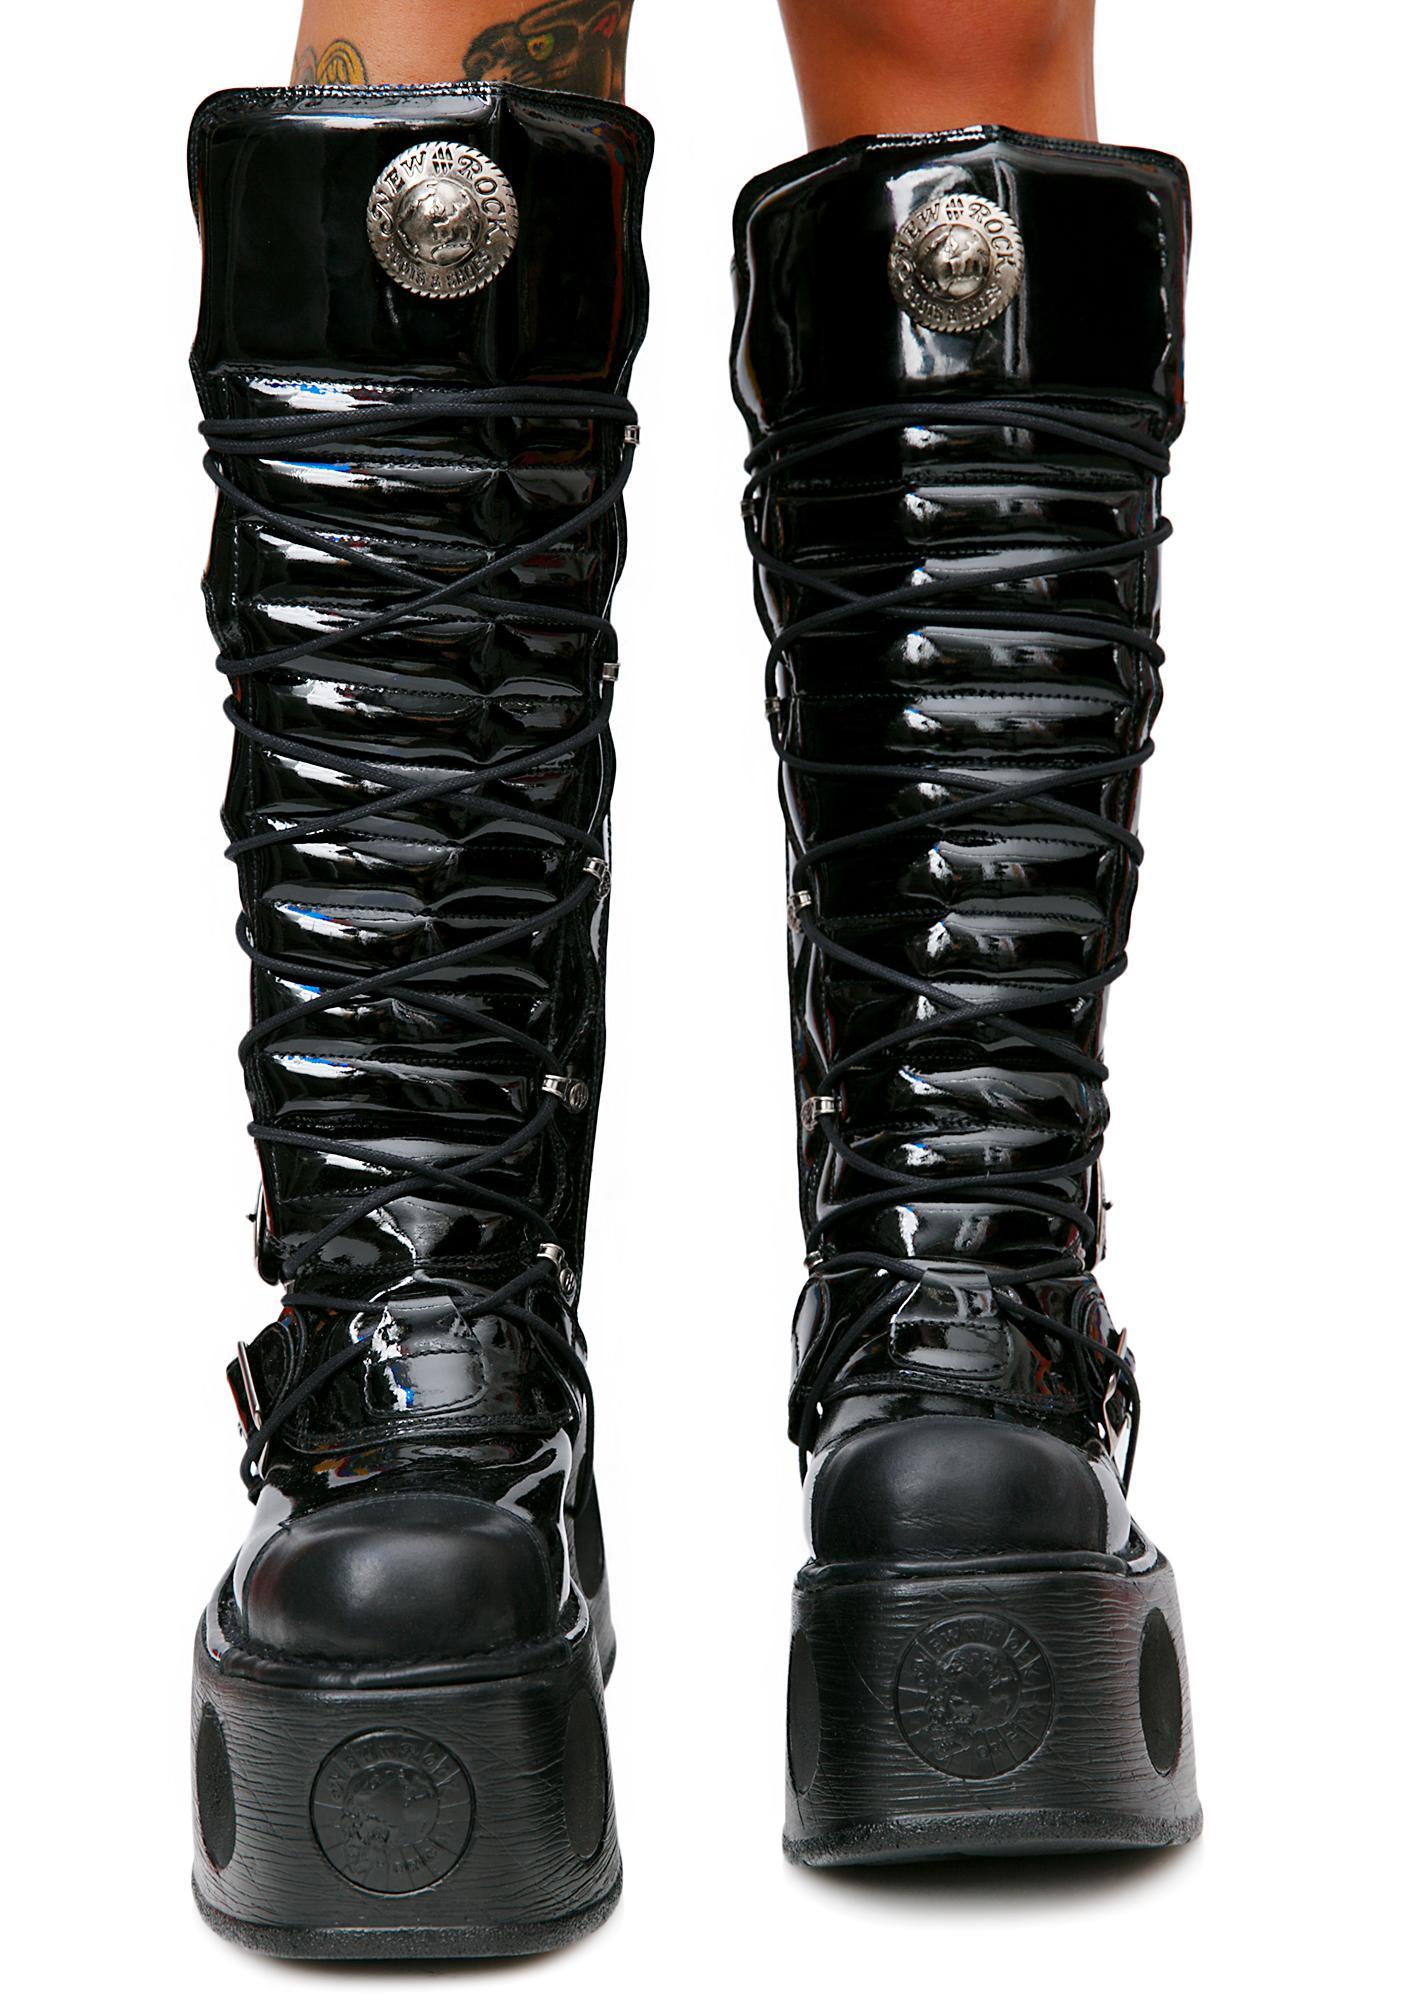 New Rock Daywalker Buckle Platform Boots